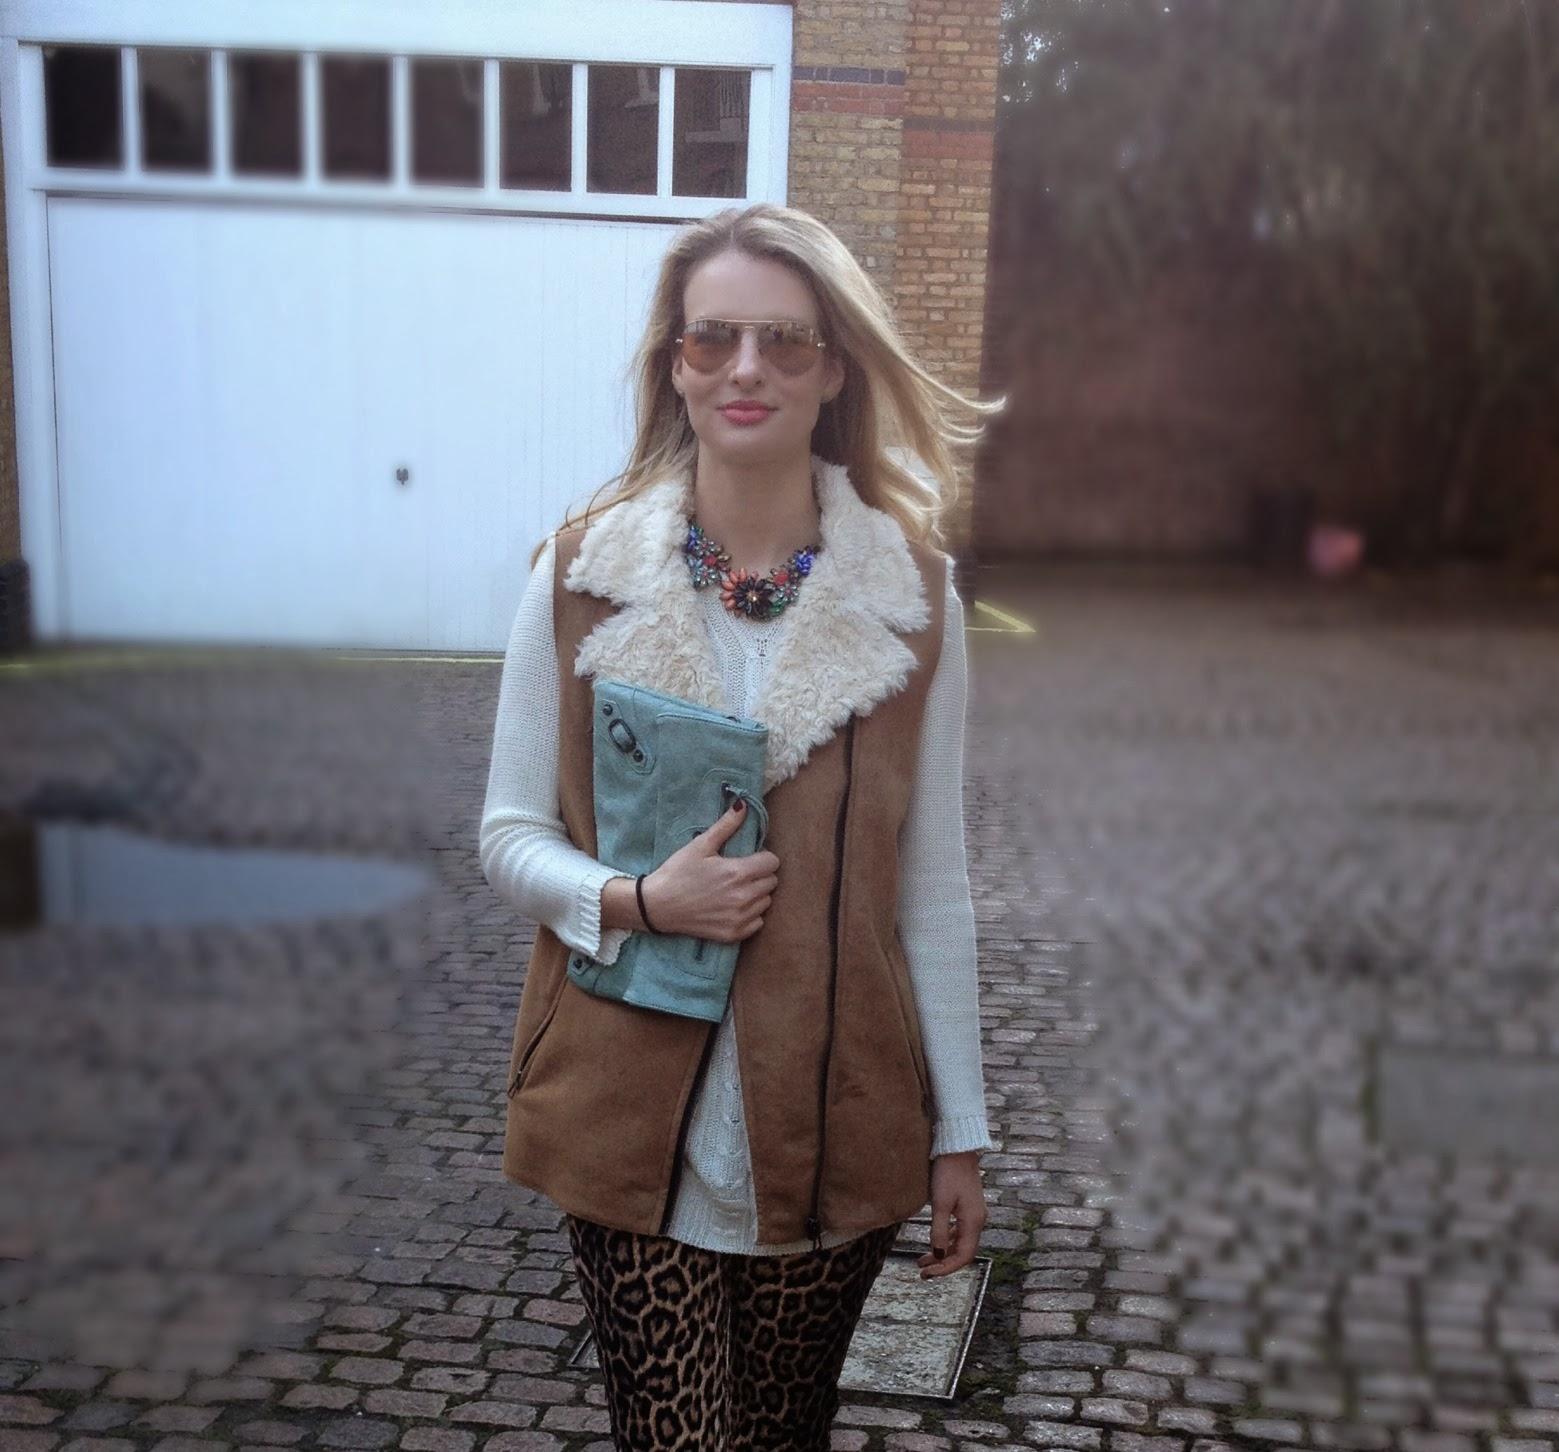 Street style, fashion blogger, chrissabella blog, leopard print pants, leopard print trousers, zara trousers, zara leopard print pants, balenciaga classic envelope, mint clutch, green clutch, balenciaga clutch